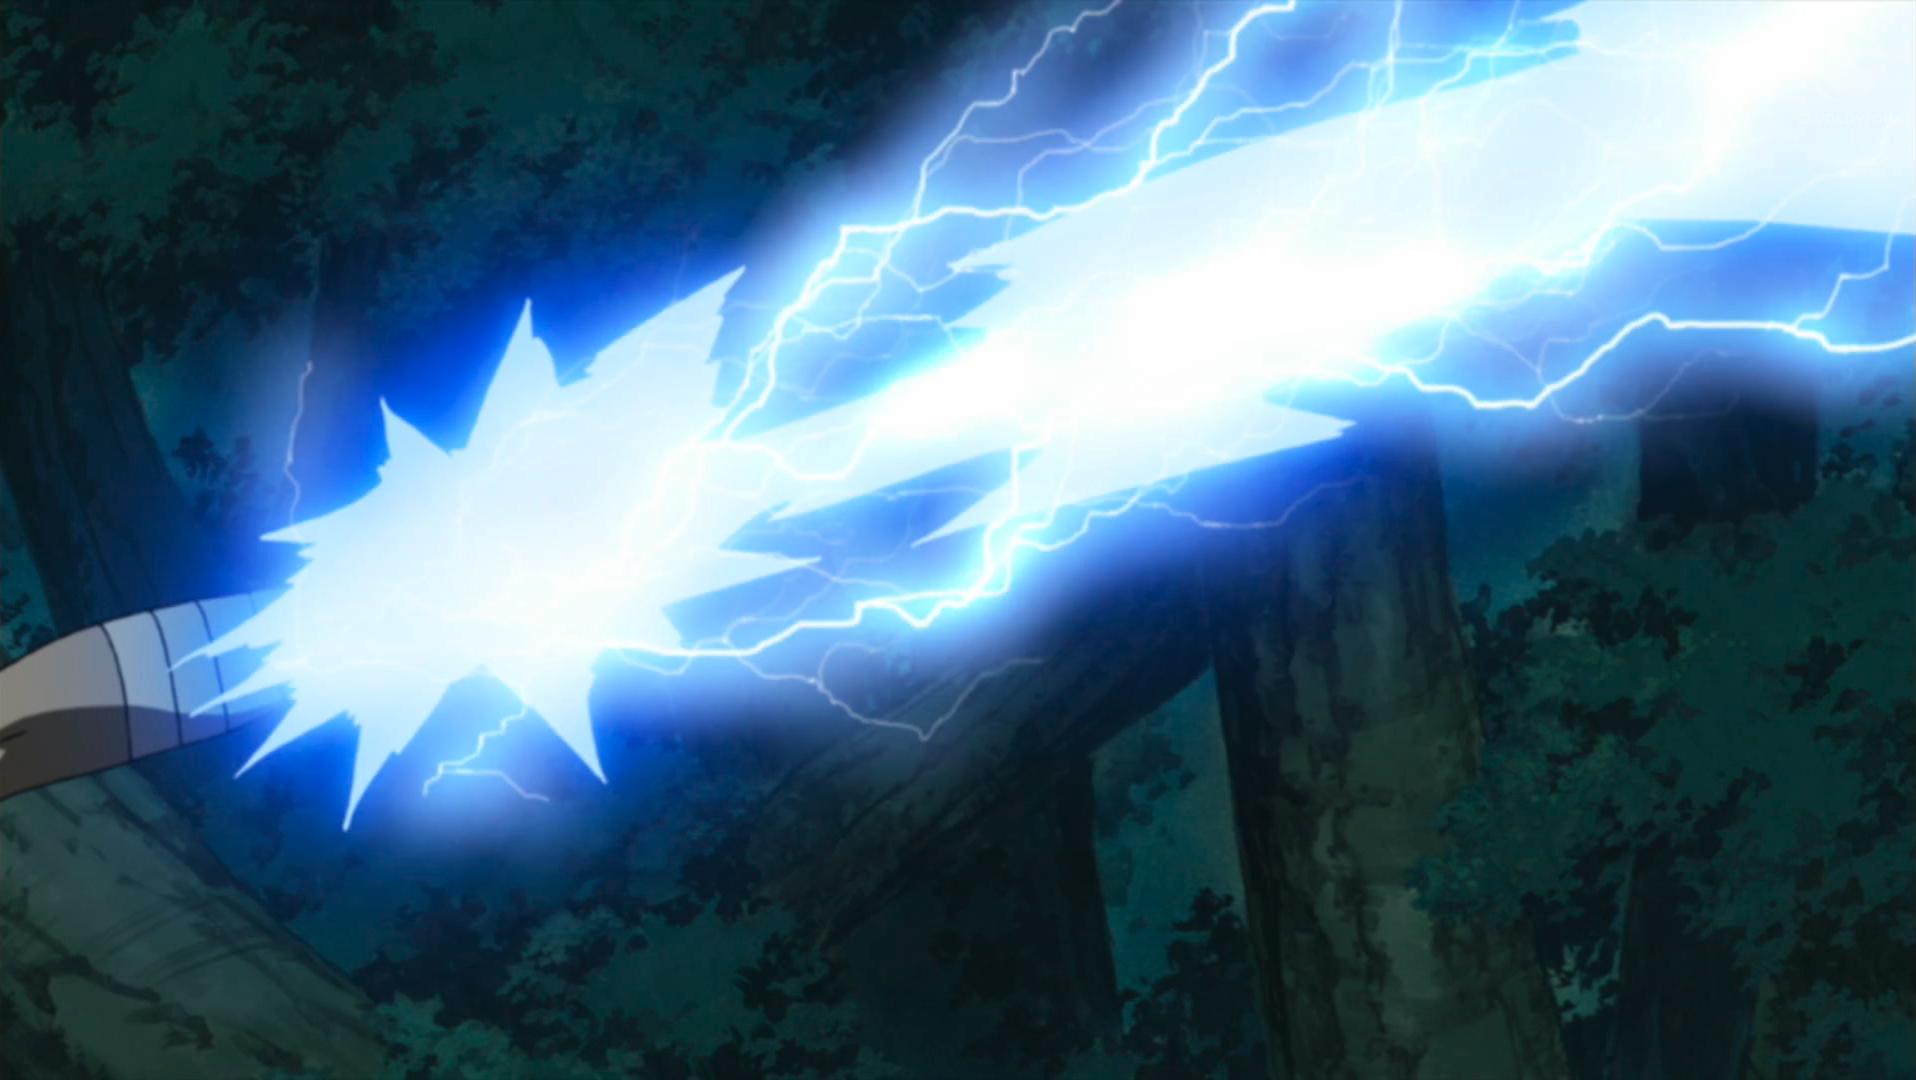 lightning strike narutopedia fandom powered by wikia